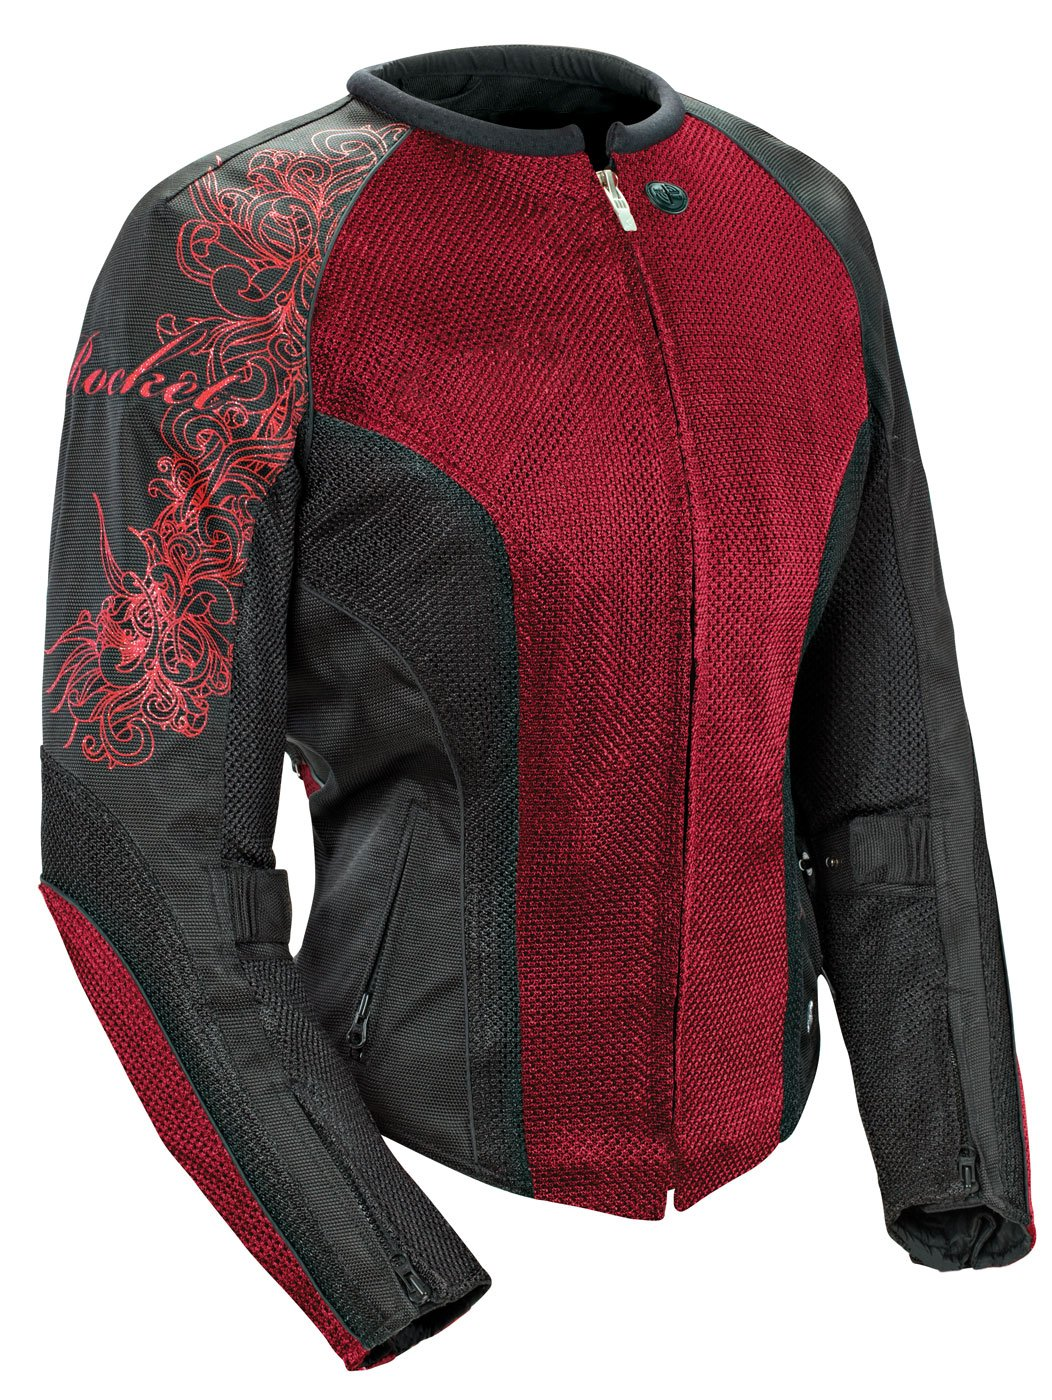 Joe Rocket Cleo 2.2 Women's Mesh Jacket (Wine/Black/Black, X-Large)